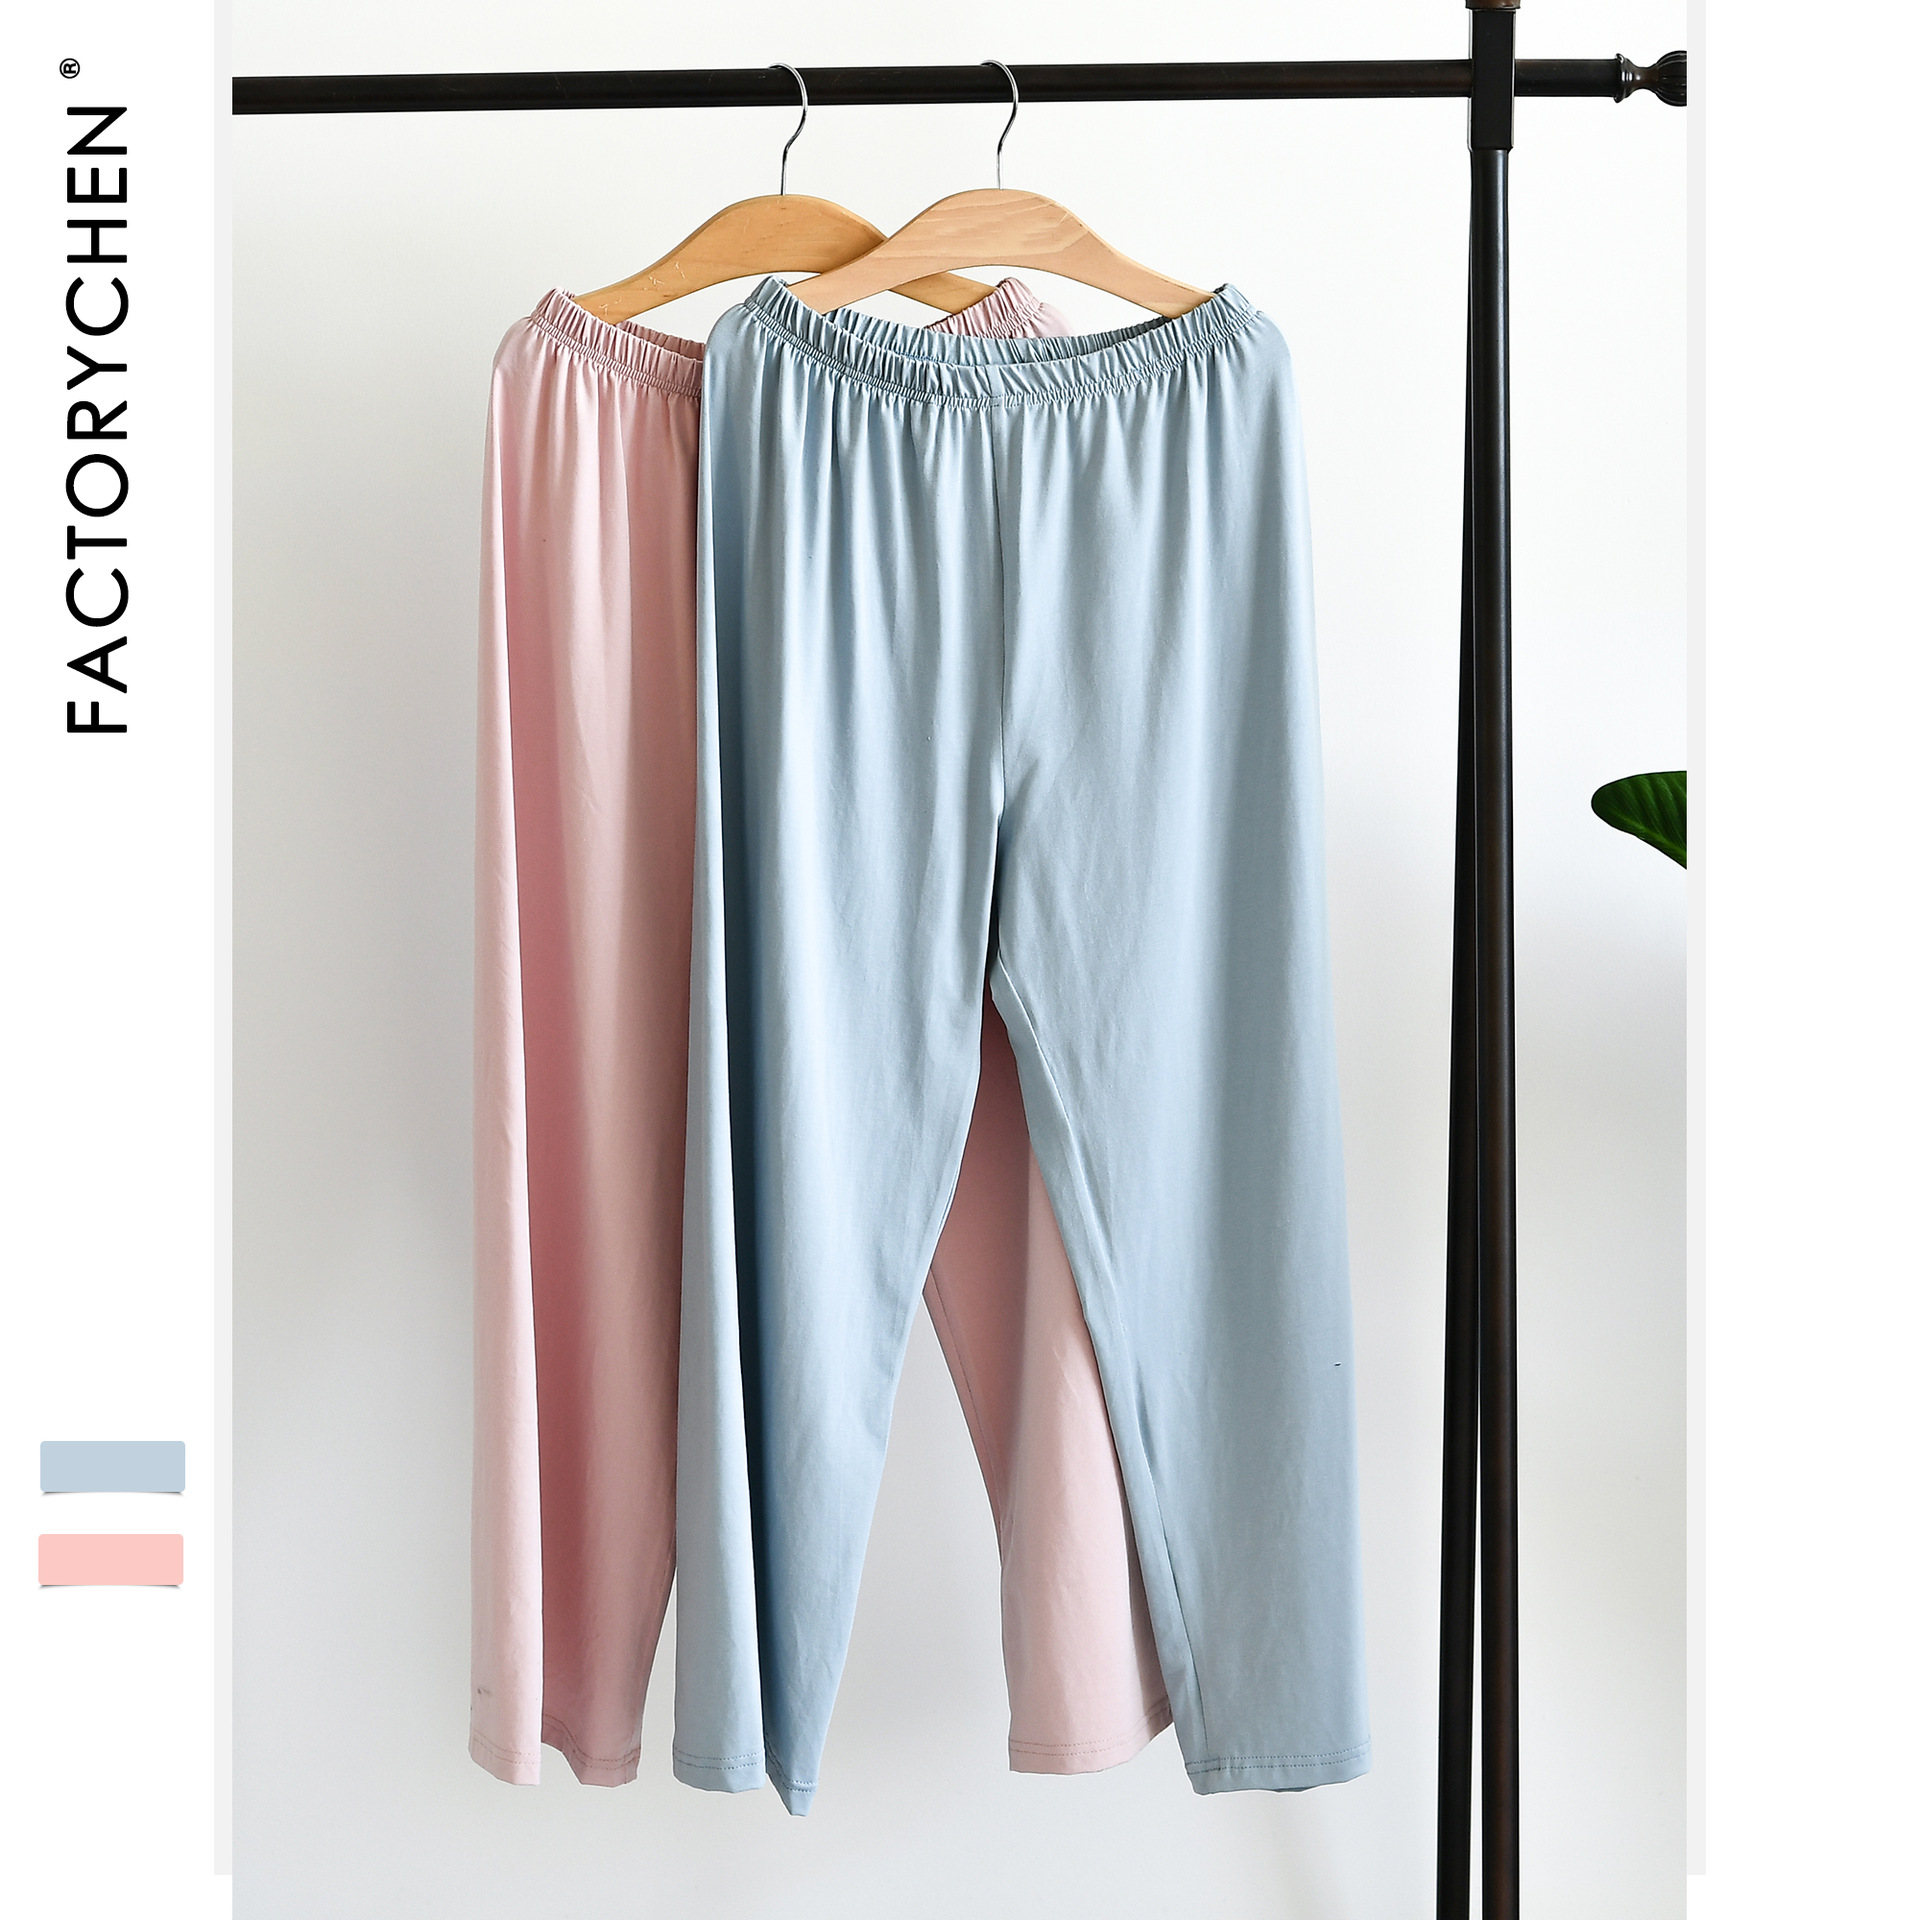 Summer Female Loose Plus Size Sleep Bottoms Comfortable Good Material Elastic Ammonia + Cotton Thin Household Sleepwear Pants 2